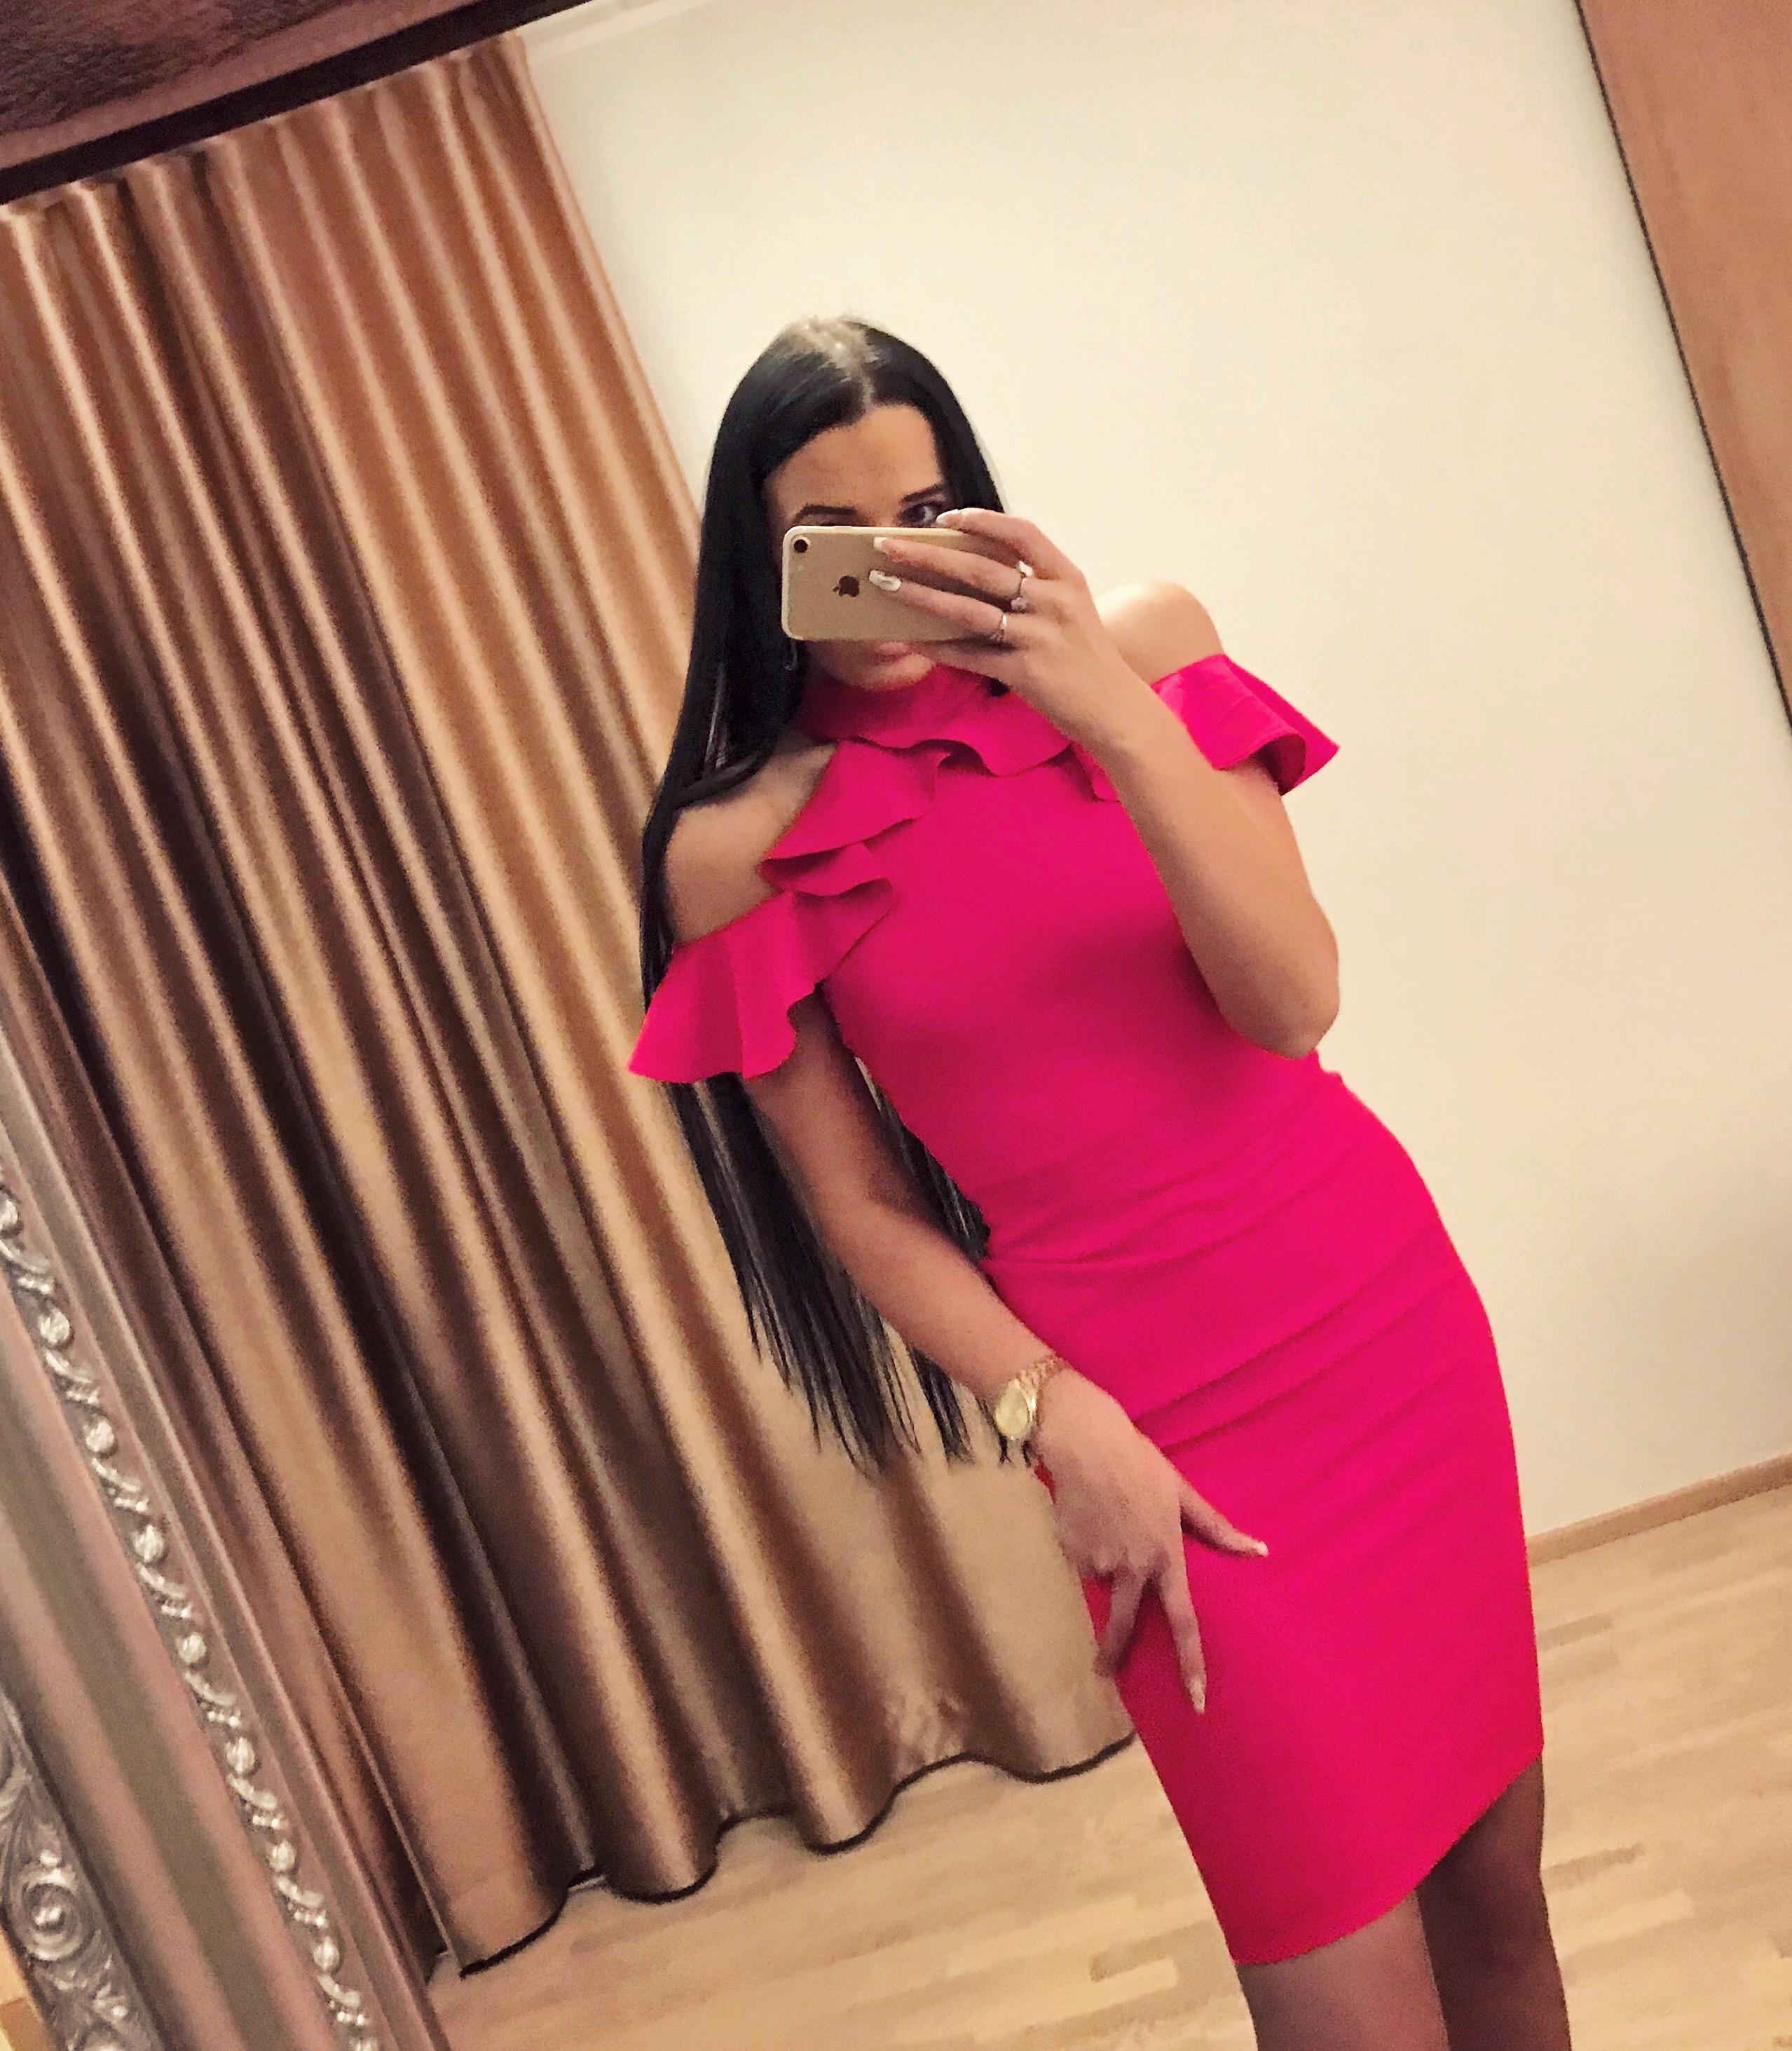 cdf6a53c189 Fuksiaroosa volangidega kleit – Kerttu's Boutique